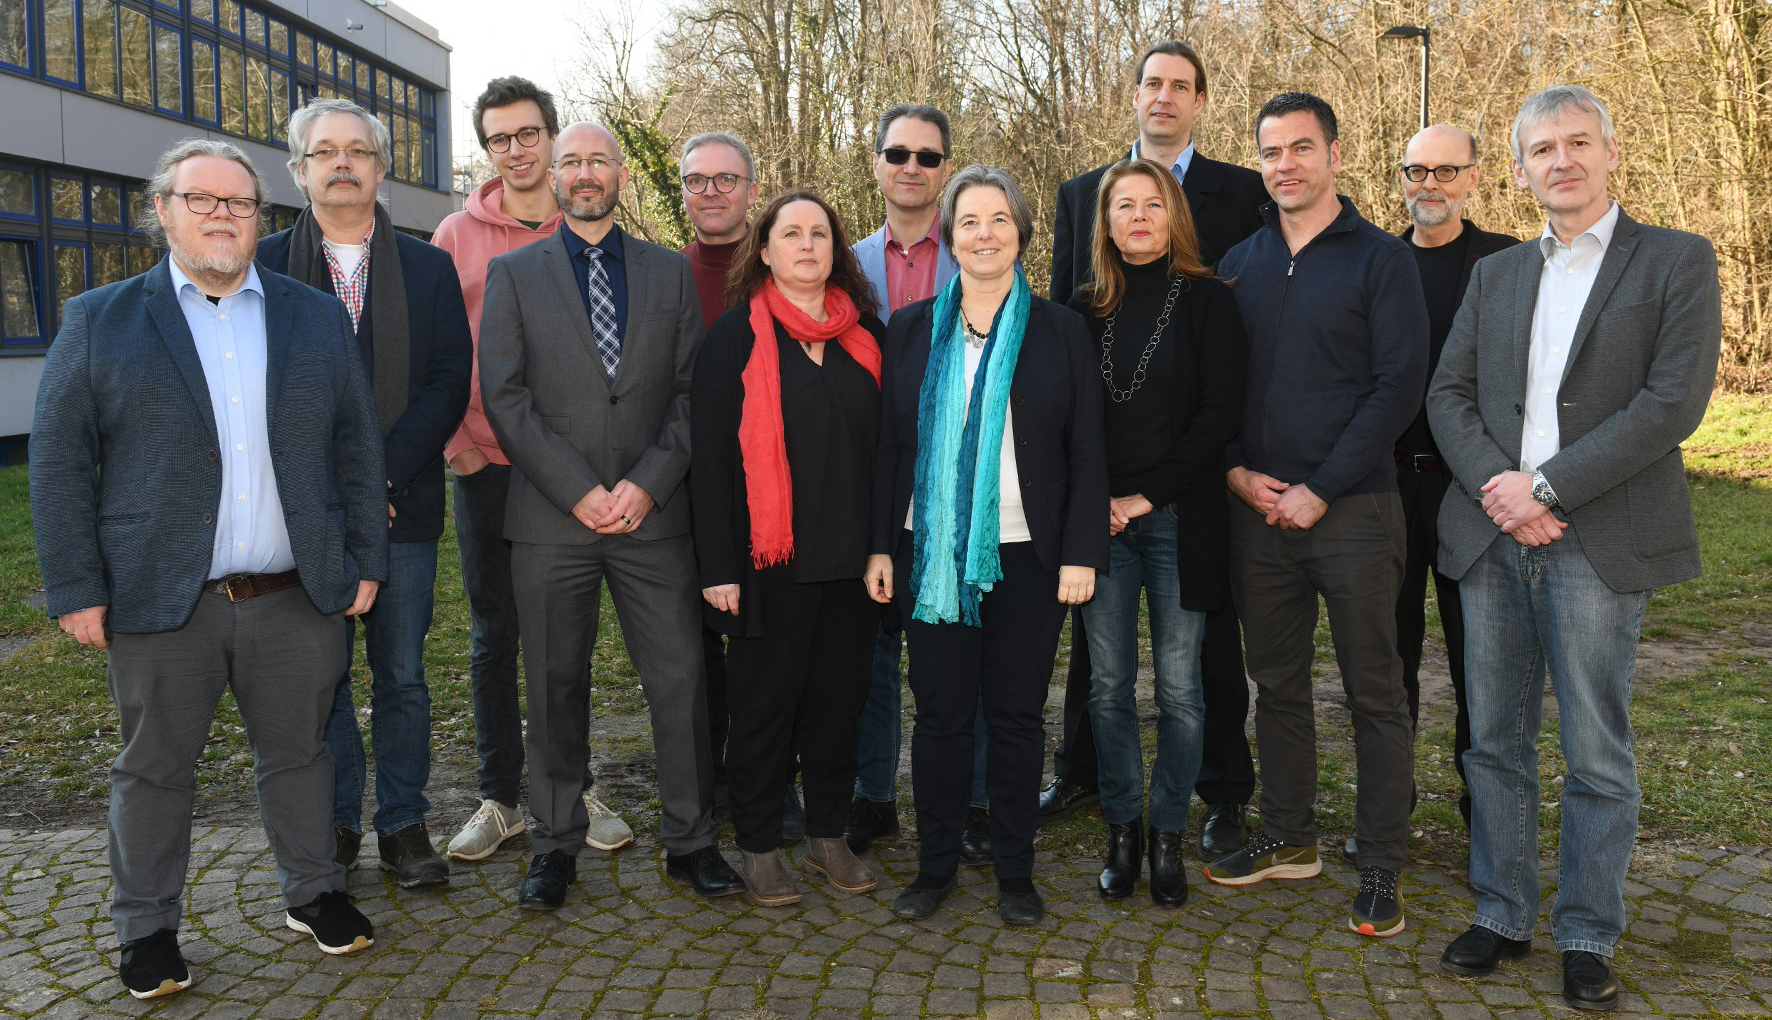 Der neugegründete Senatsausschuss Landau. Quelle: Universität Koblenz-Landau